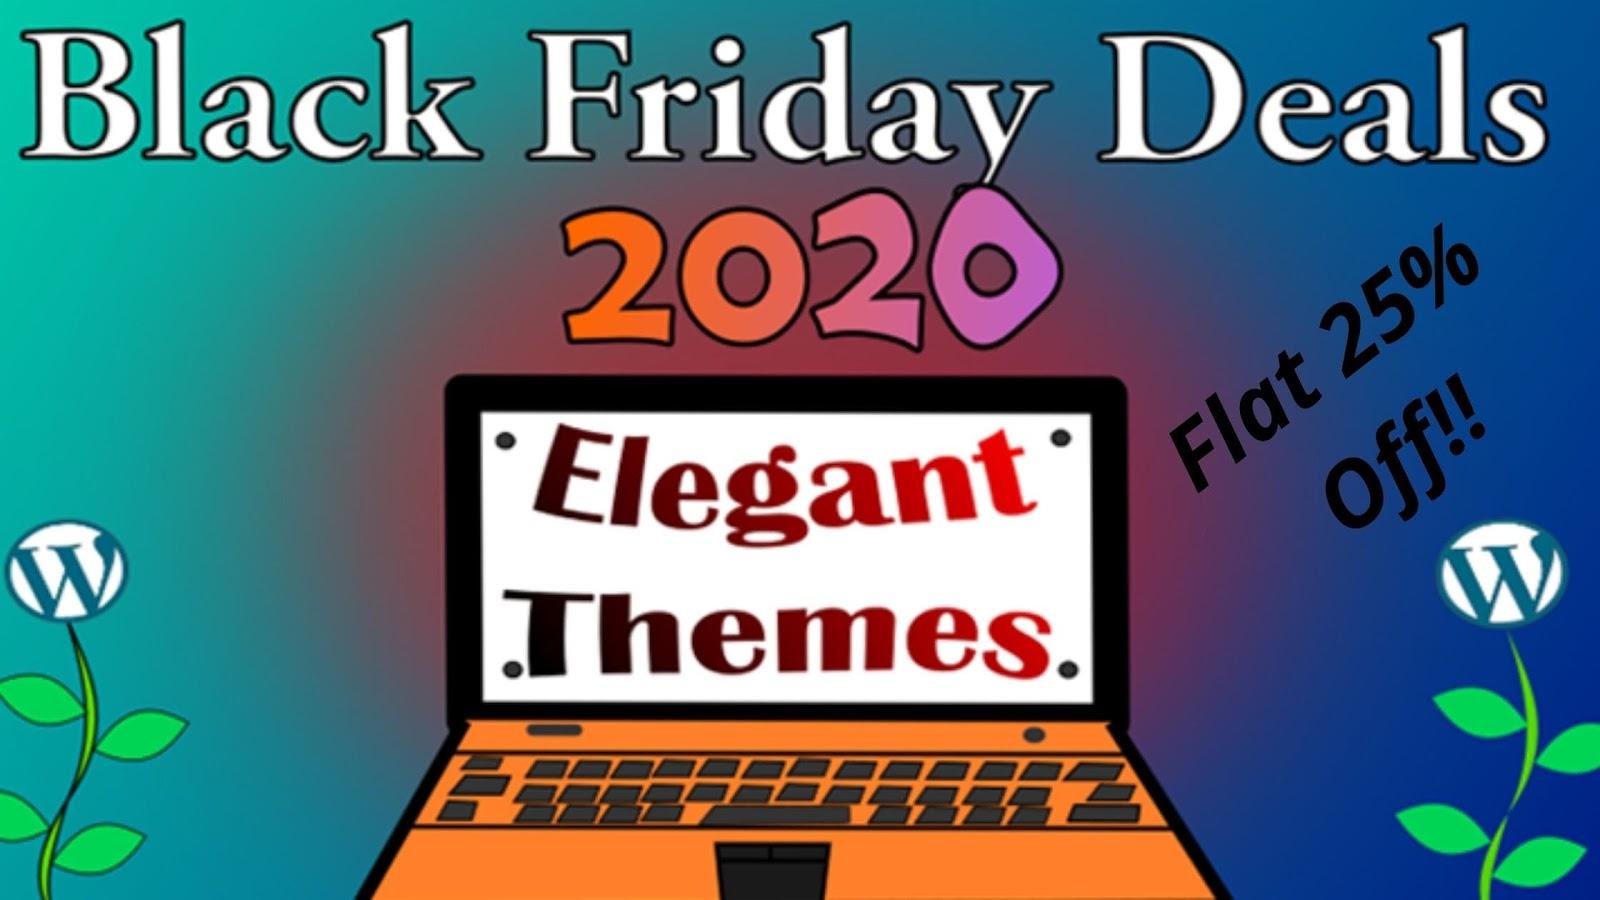 Elegant Themes: 25% Off